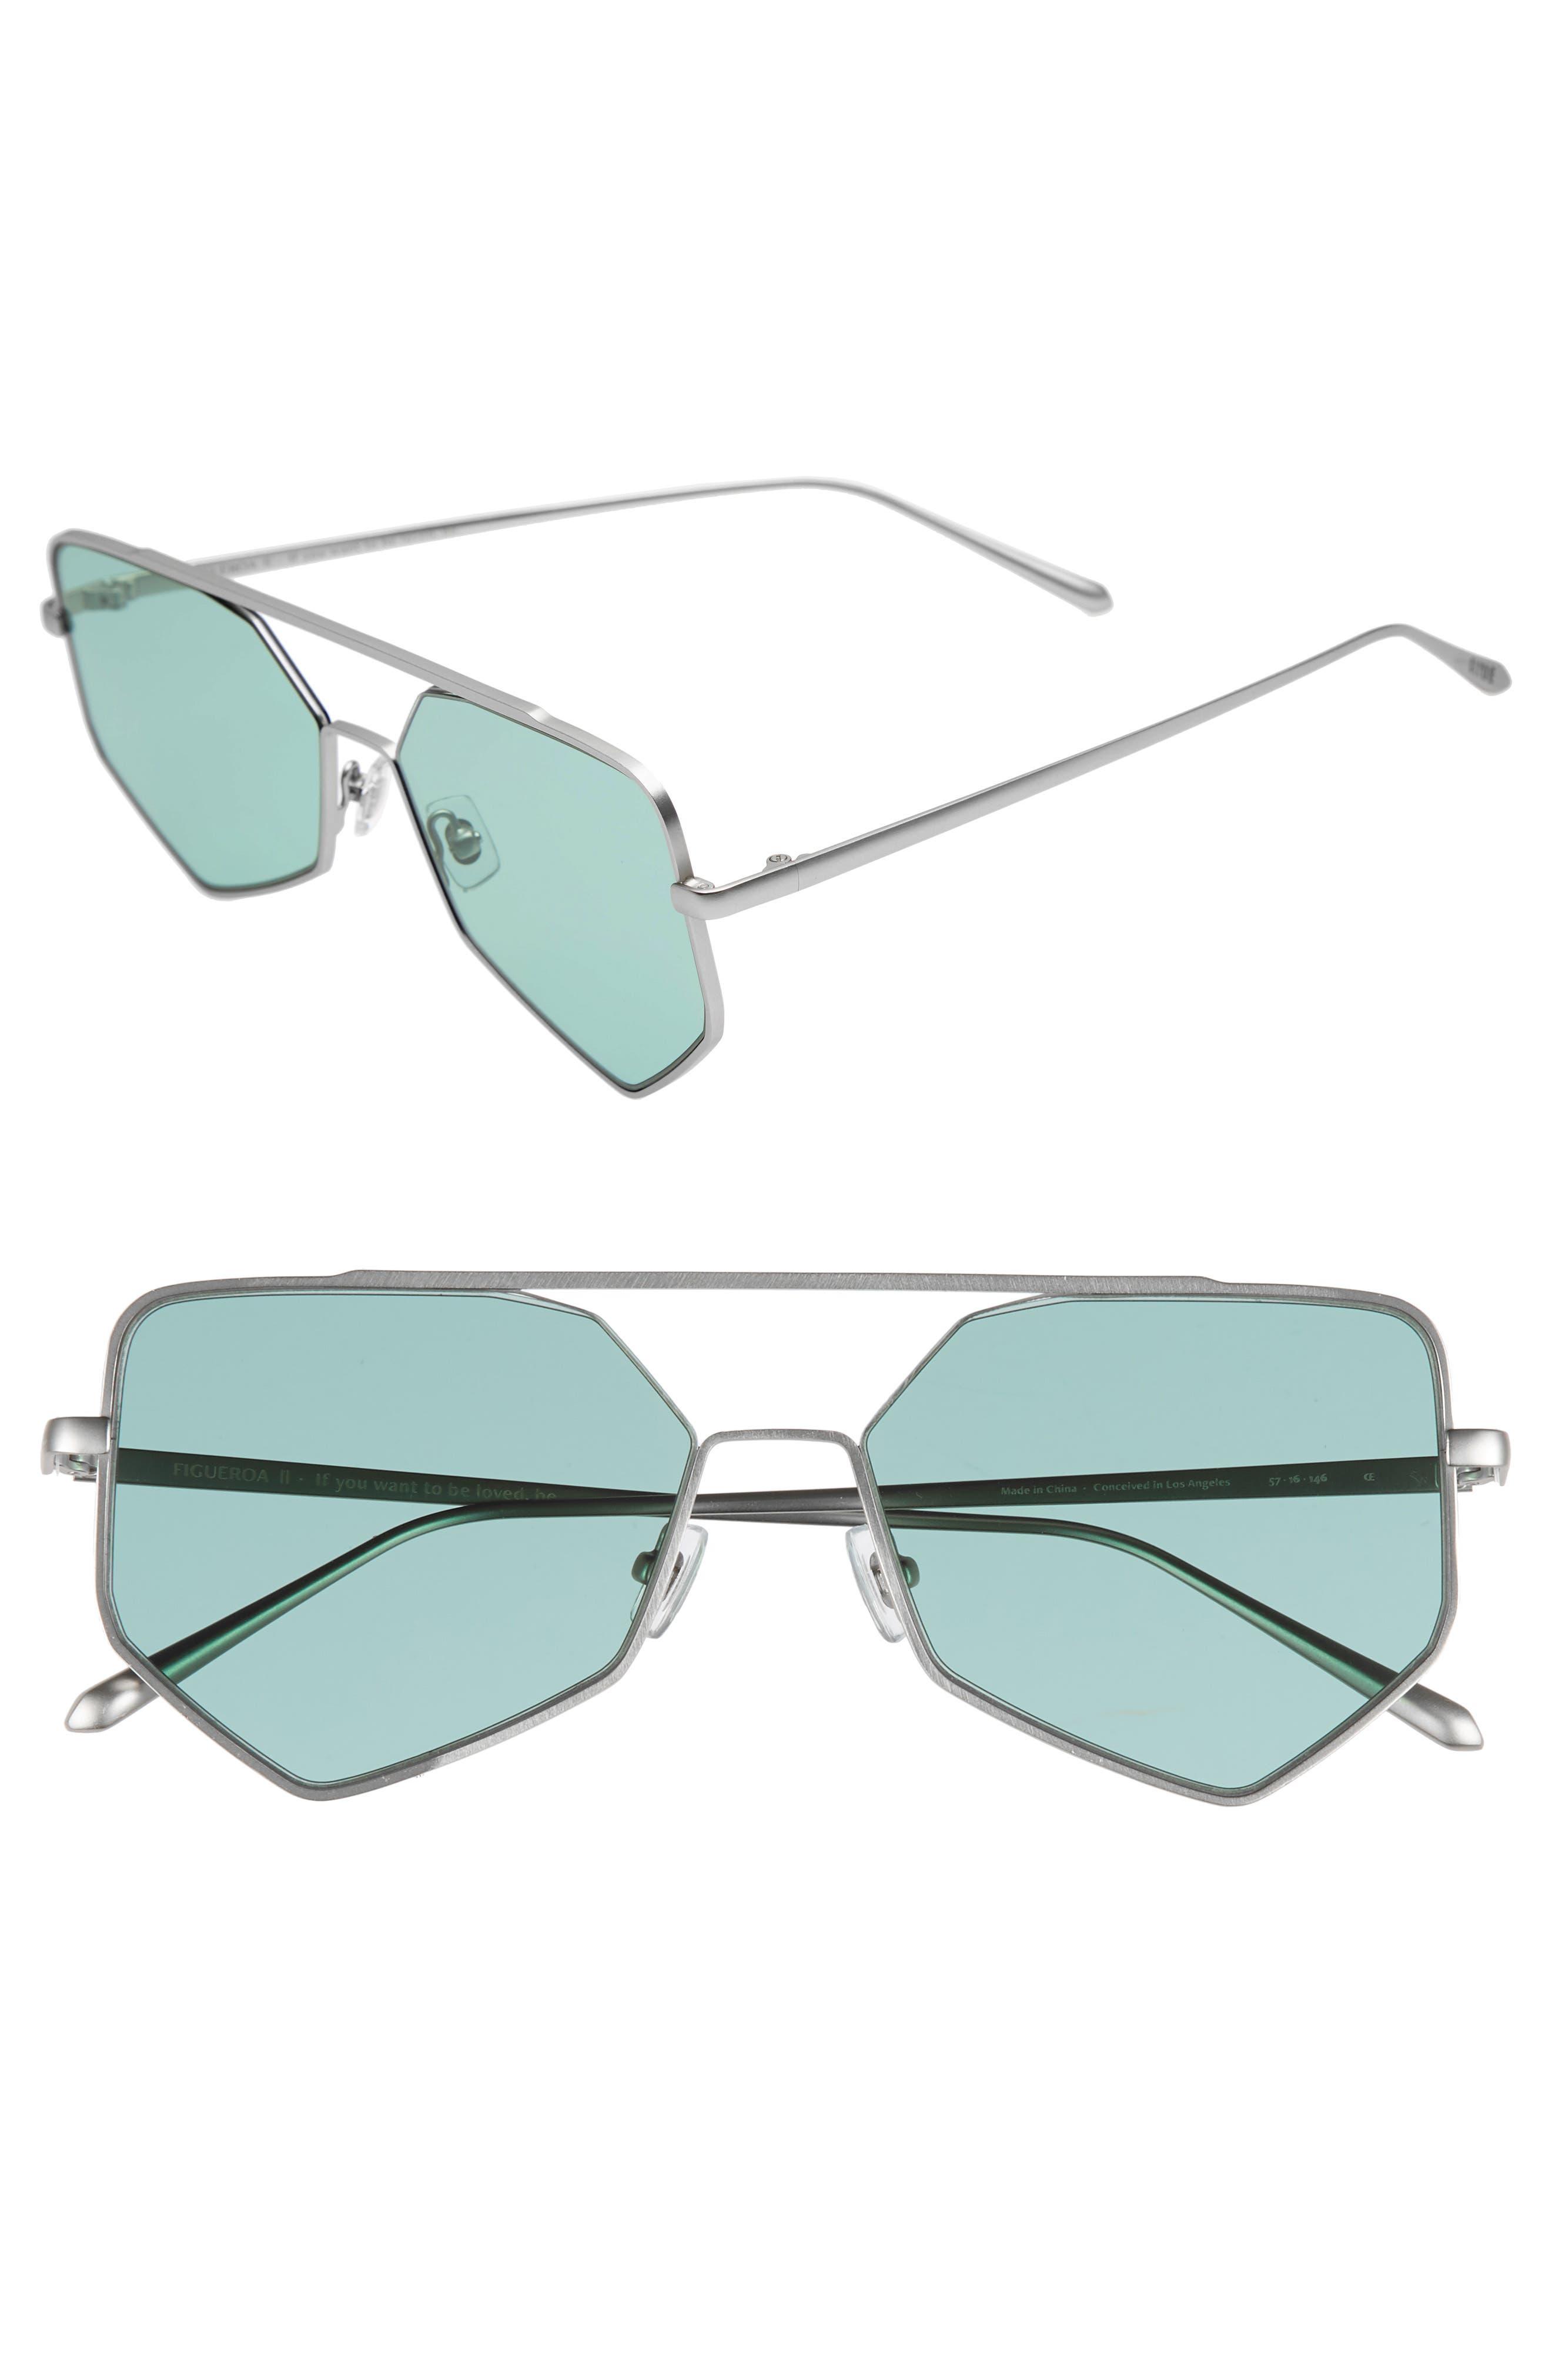 Bonnie Clyde Figueroa Ii 57Mm Aviator Sunglasses - Olive